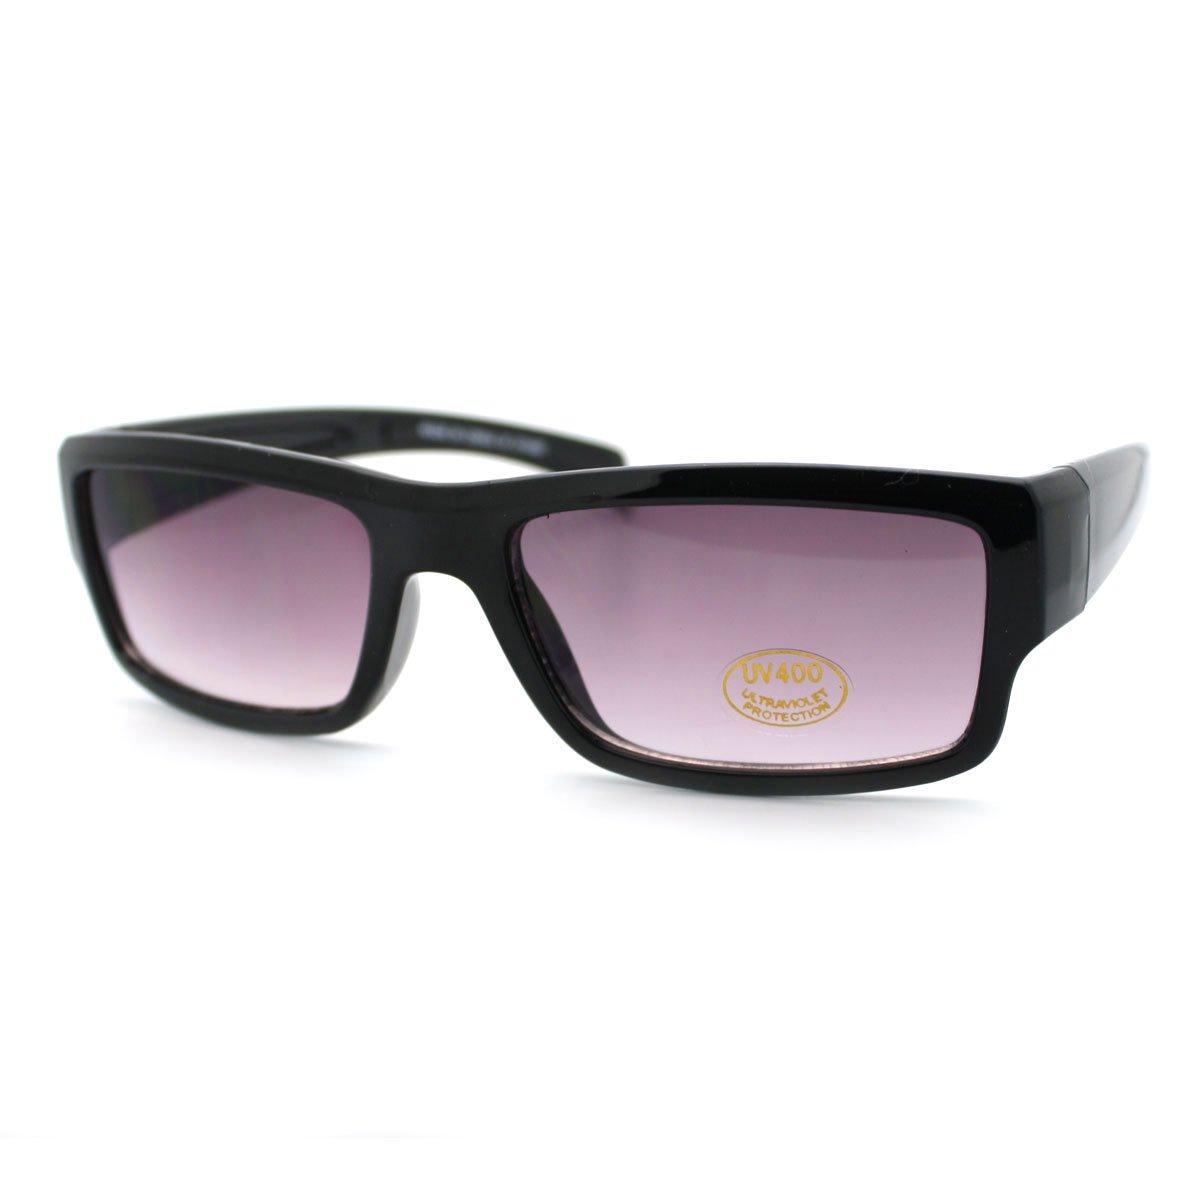 Mens Narrow Lens Rectangular Classic Sunglasses